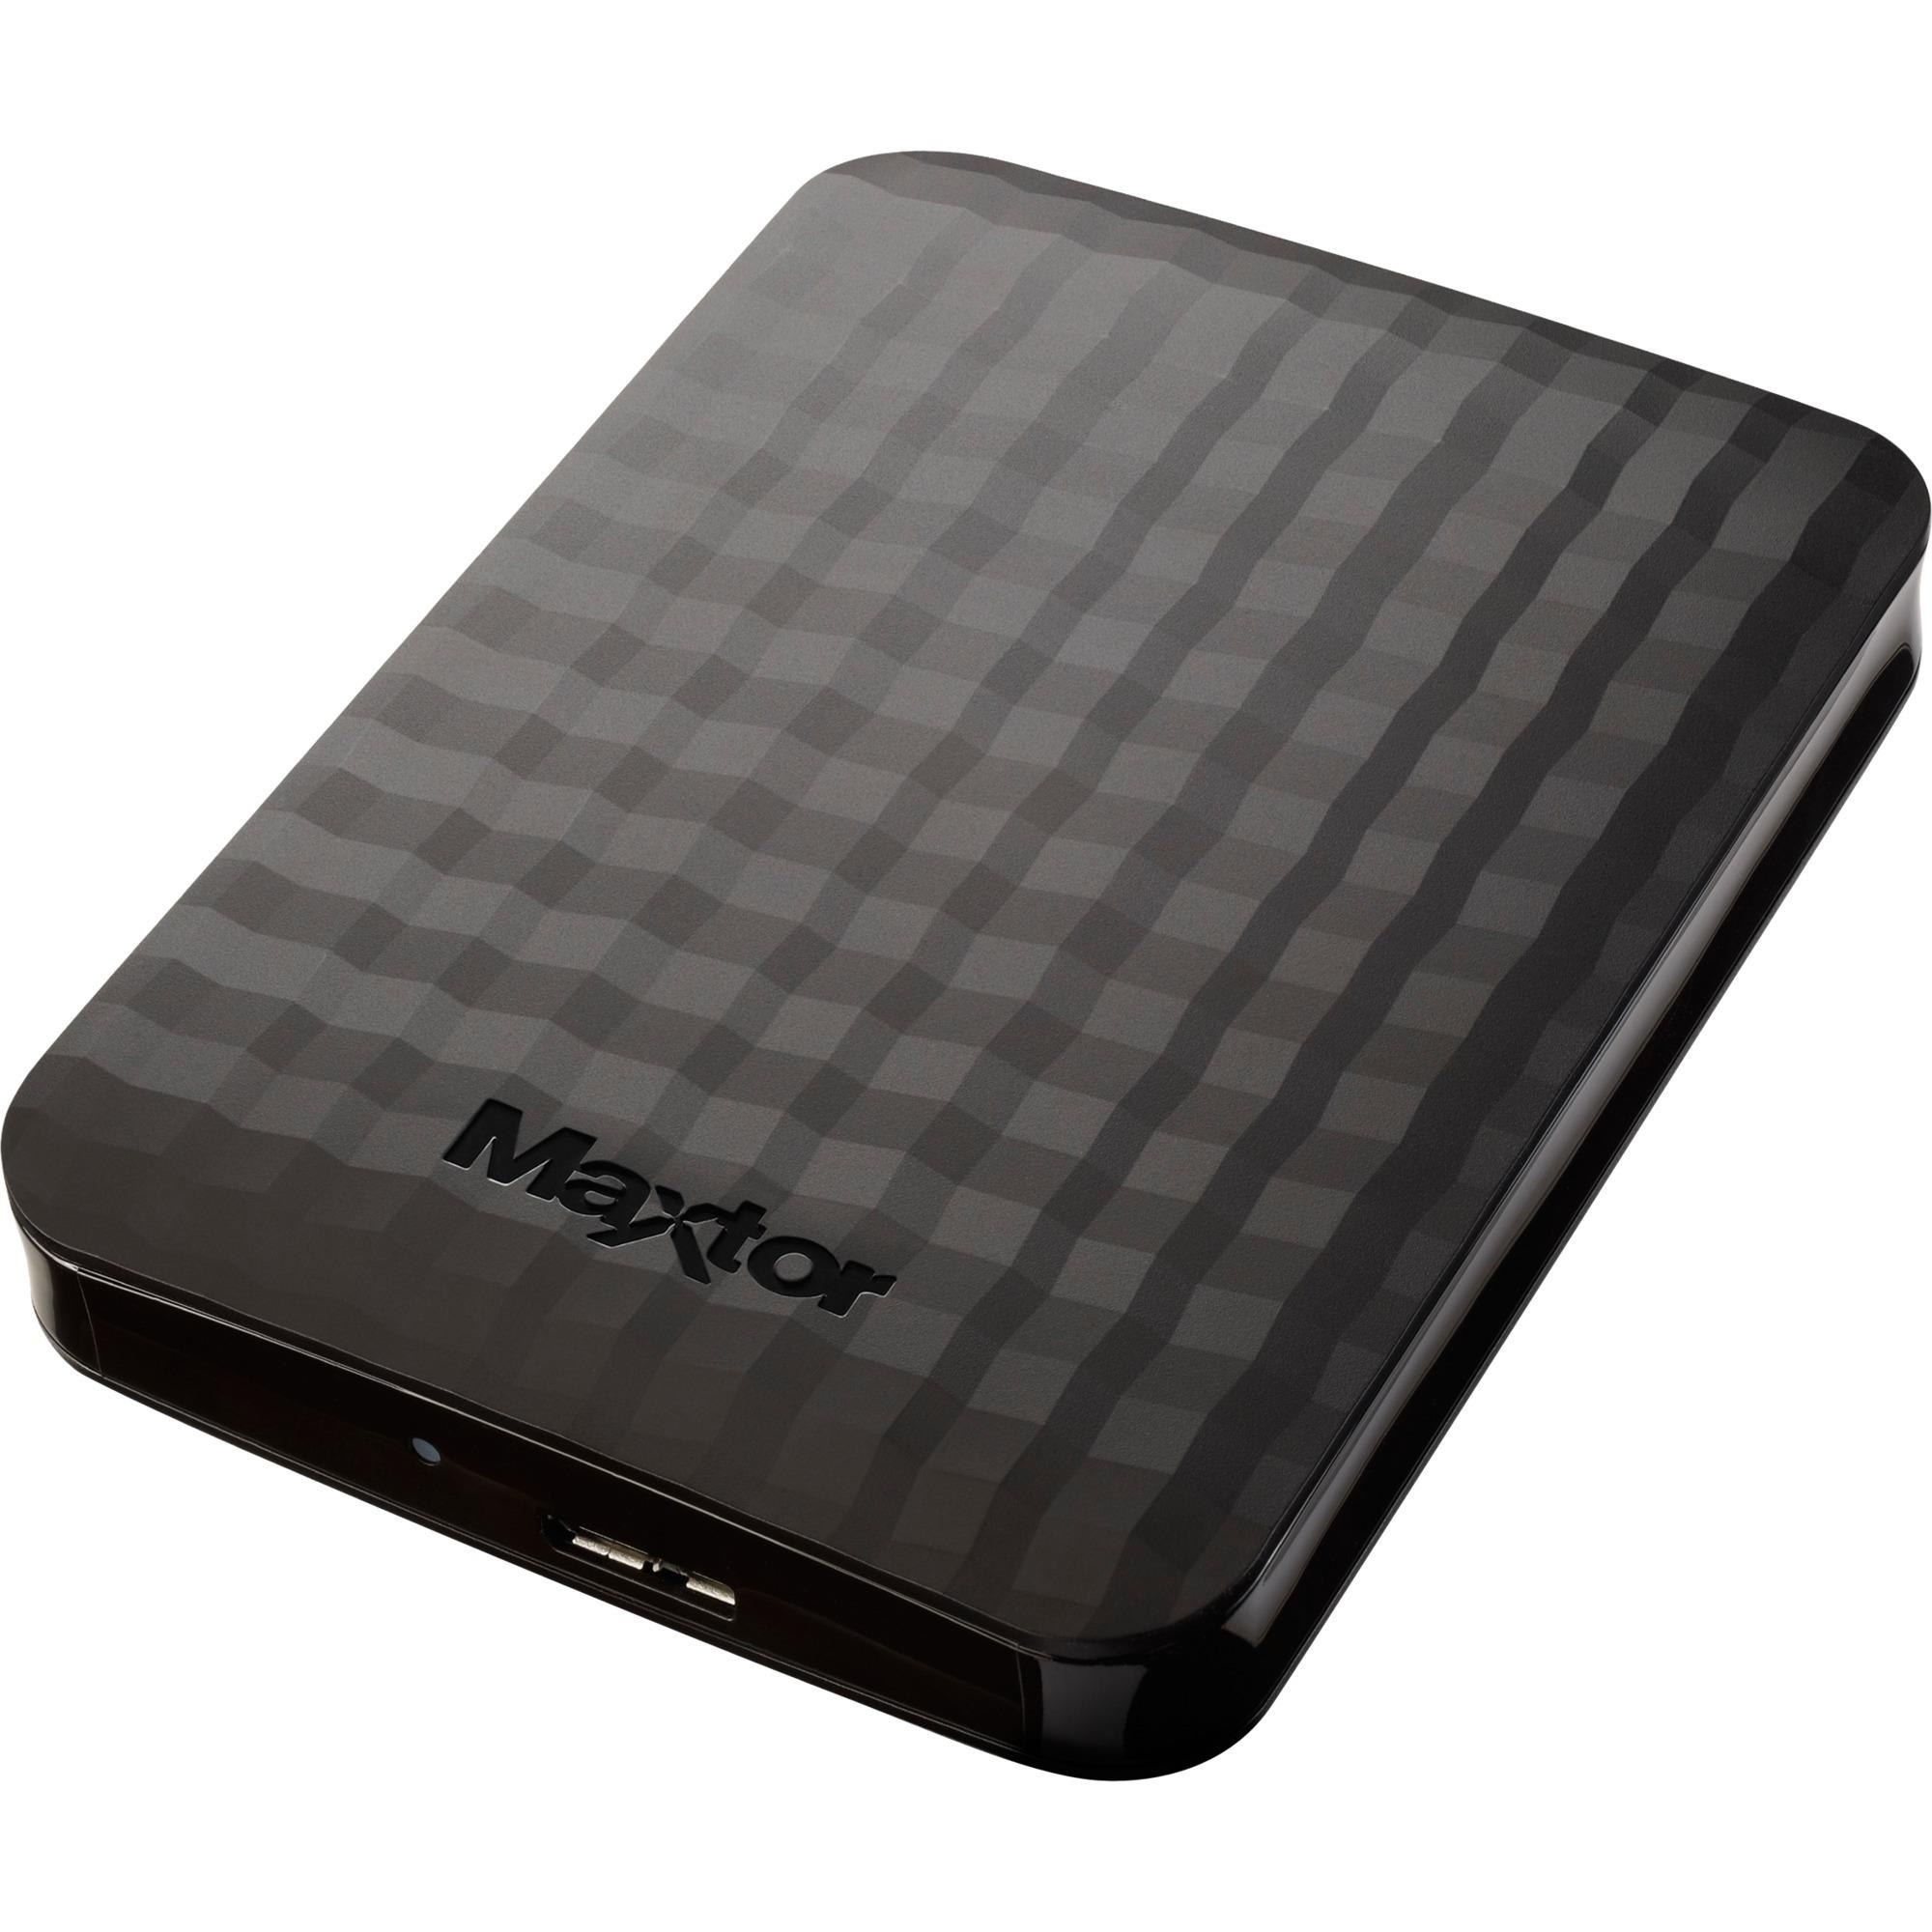 M3 500GB Negro disco duro externo, Unidad de disco duro